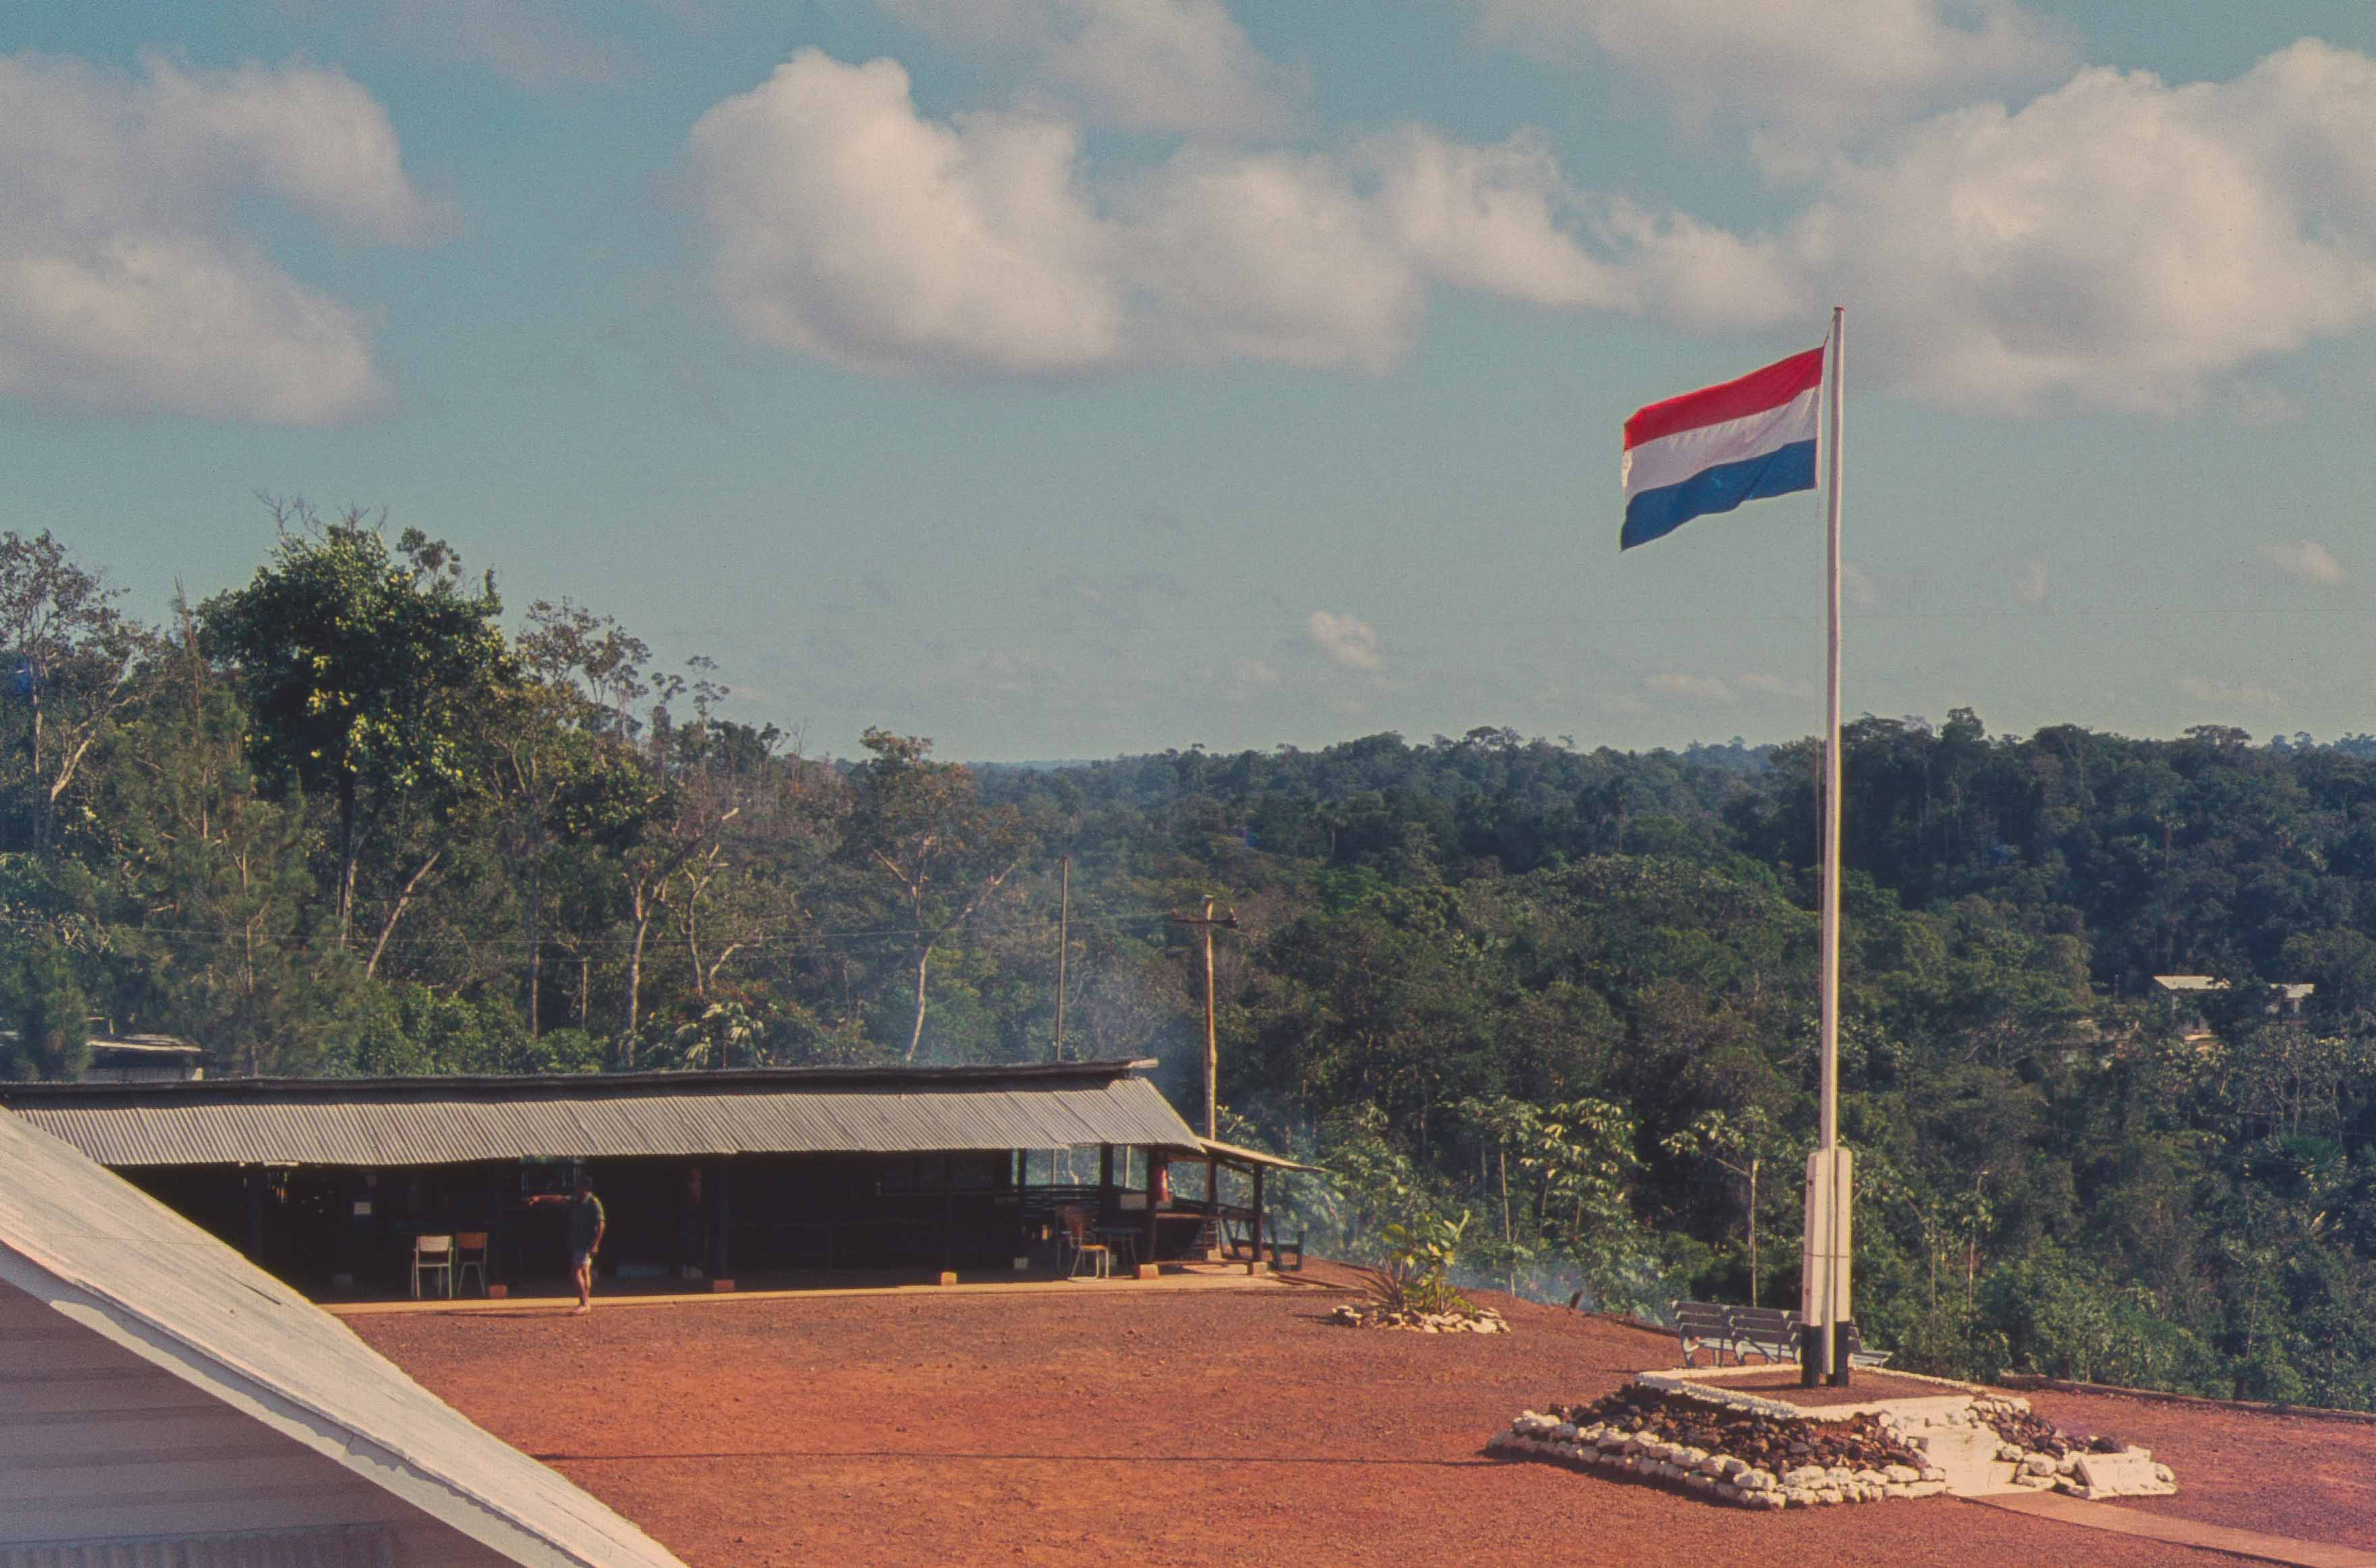 504. Suriname